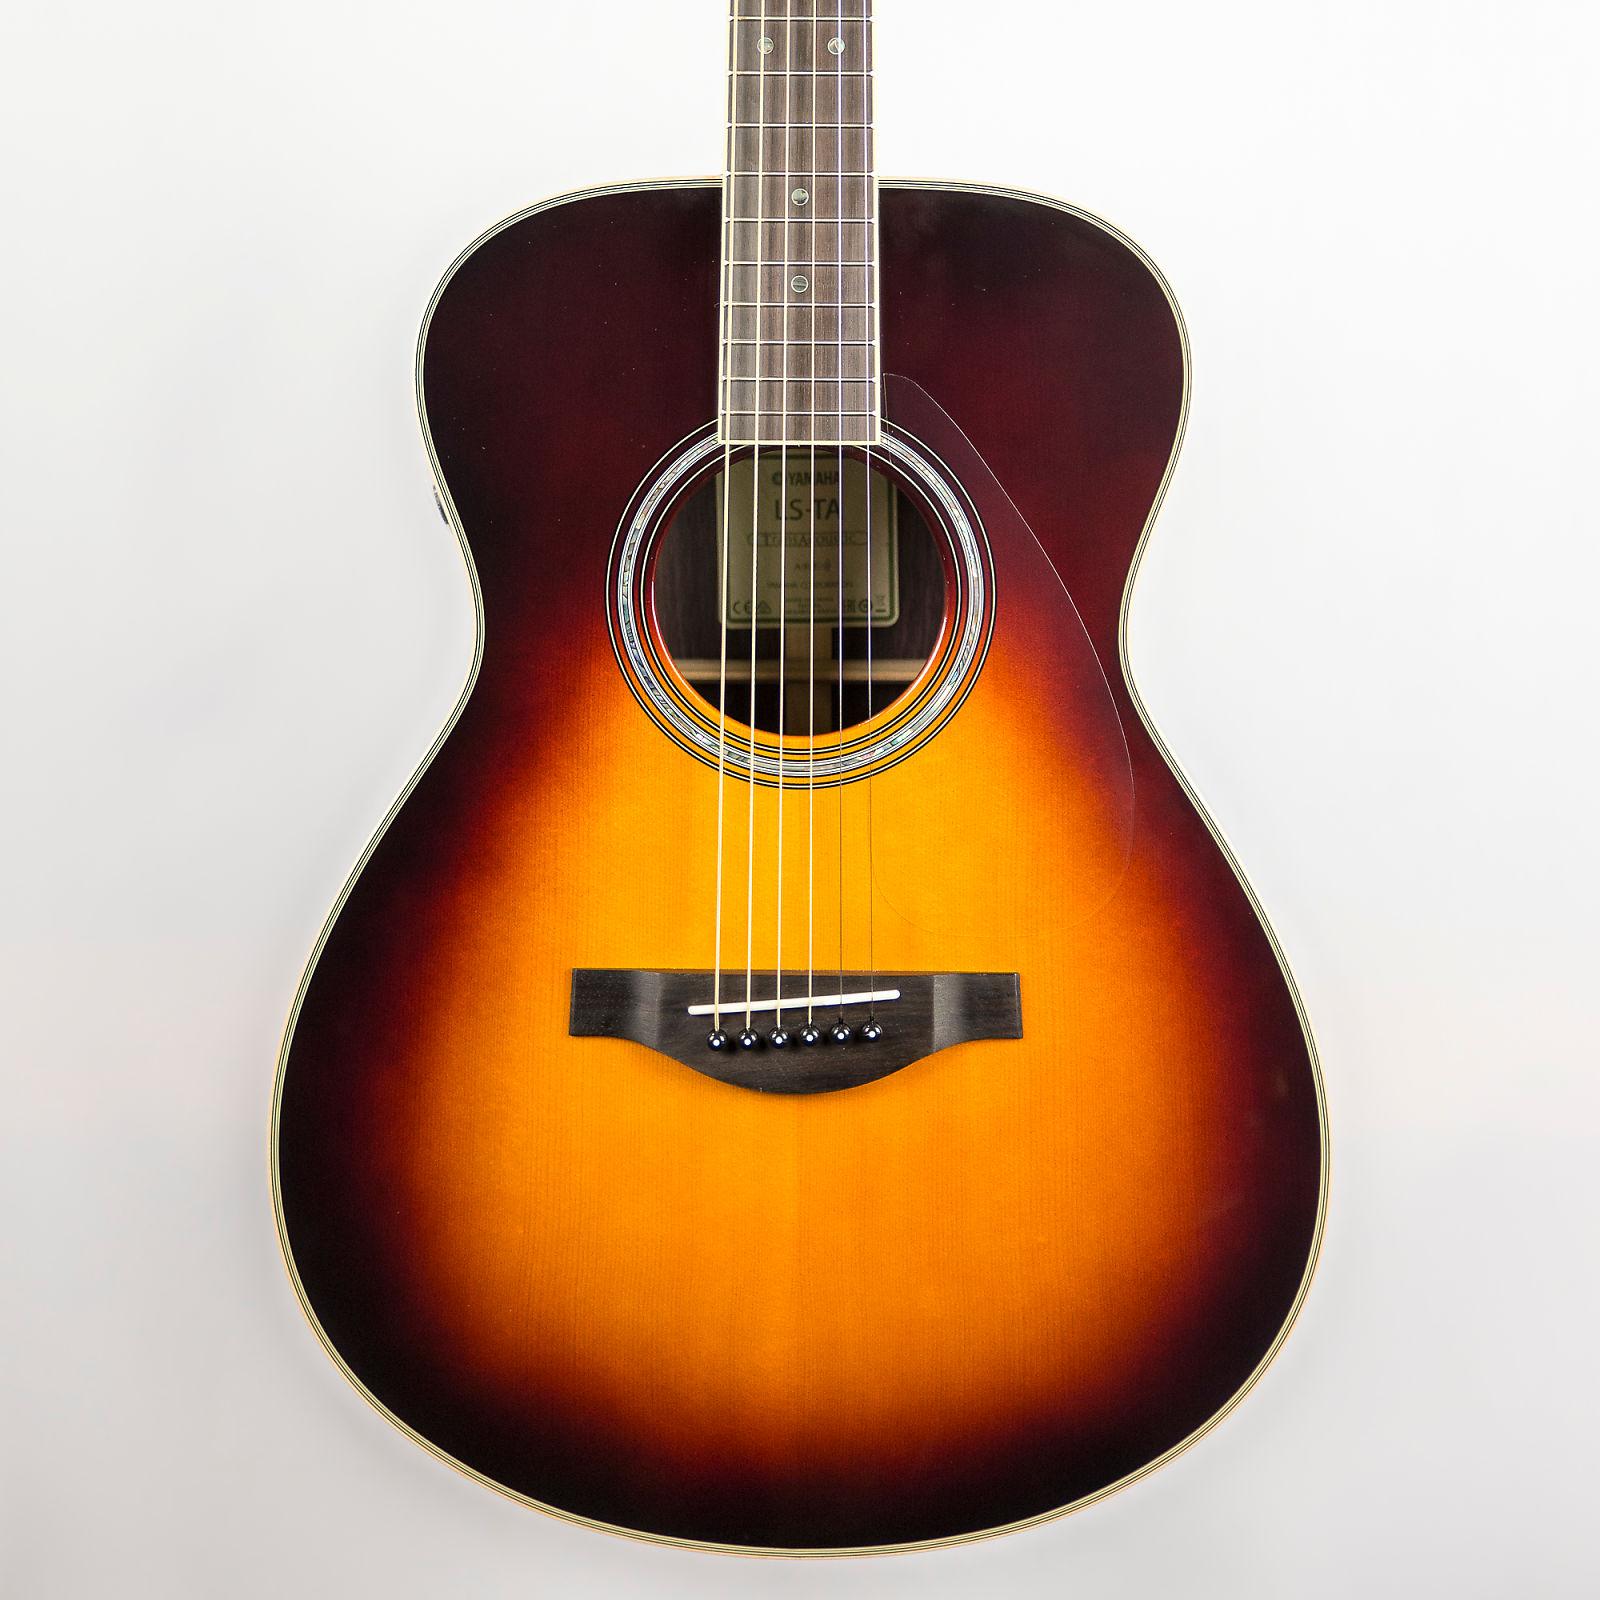 Yamaha LS-TA TransAcoustic Guitar in Brown Sunburst